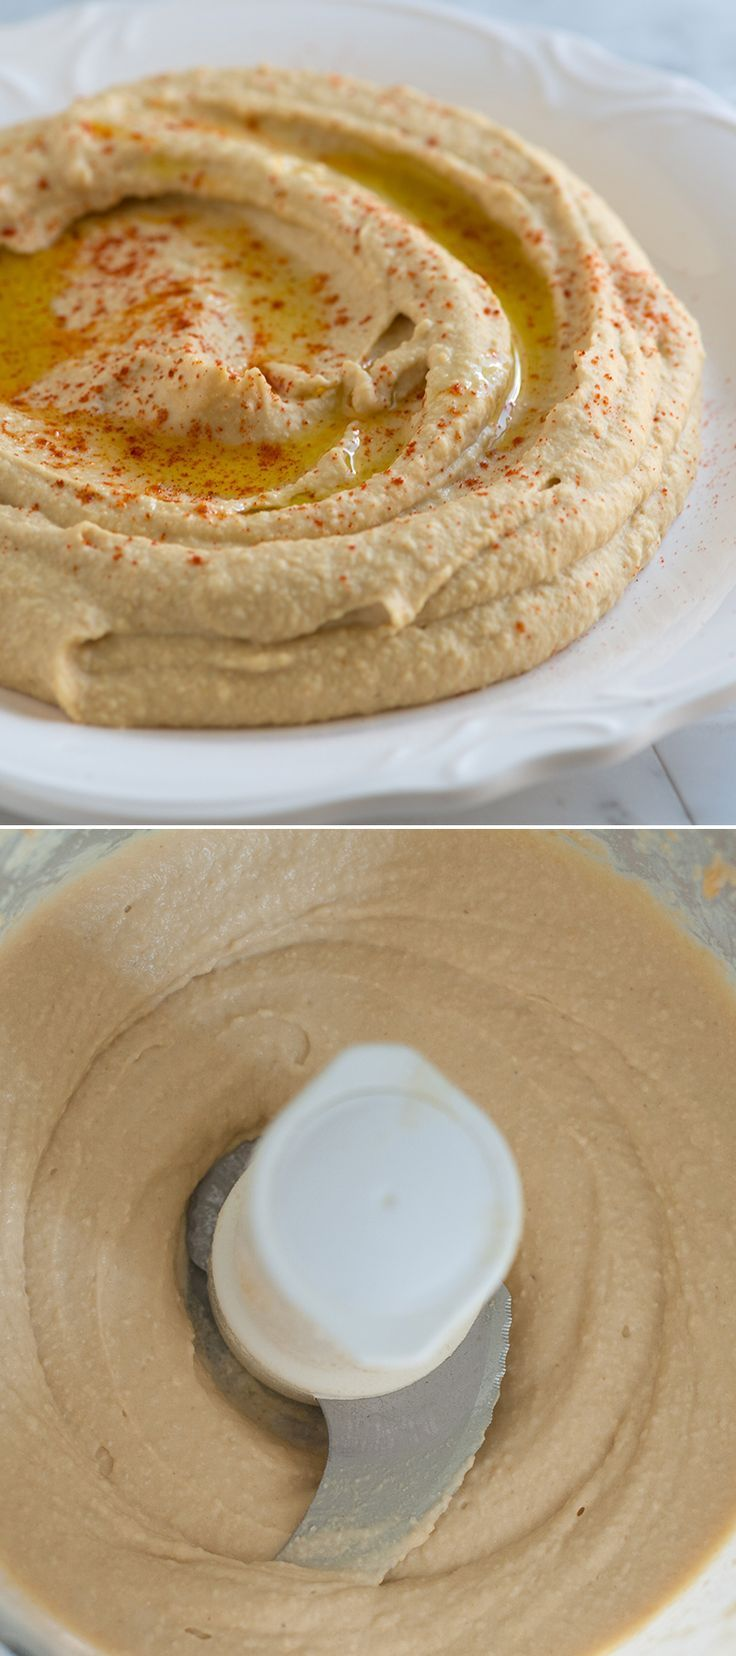 How To Make Hummus Really Smooth